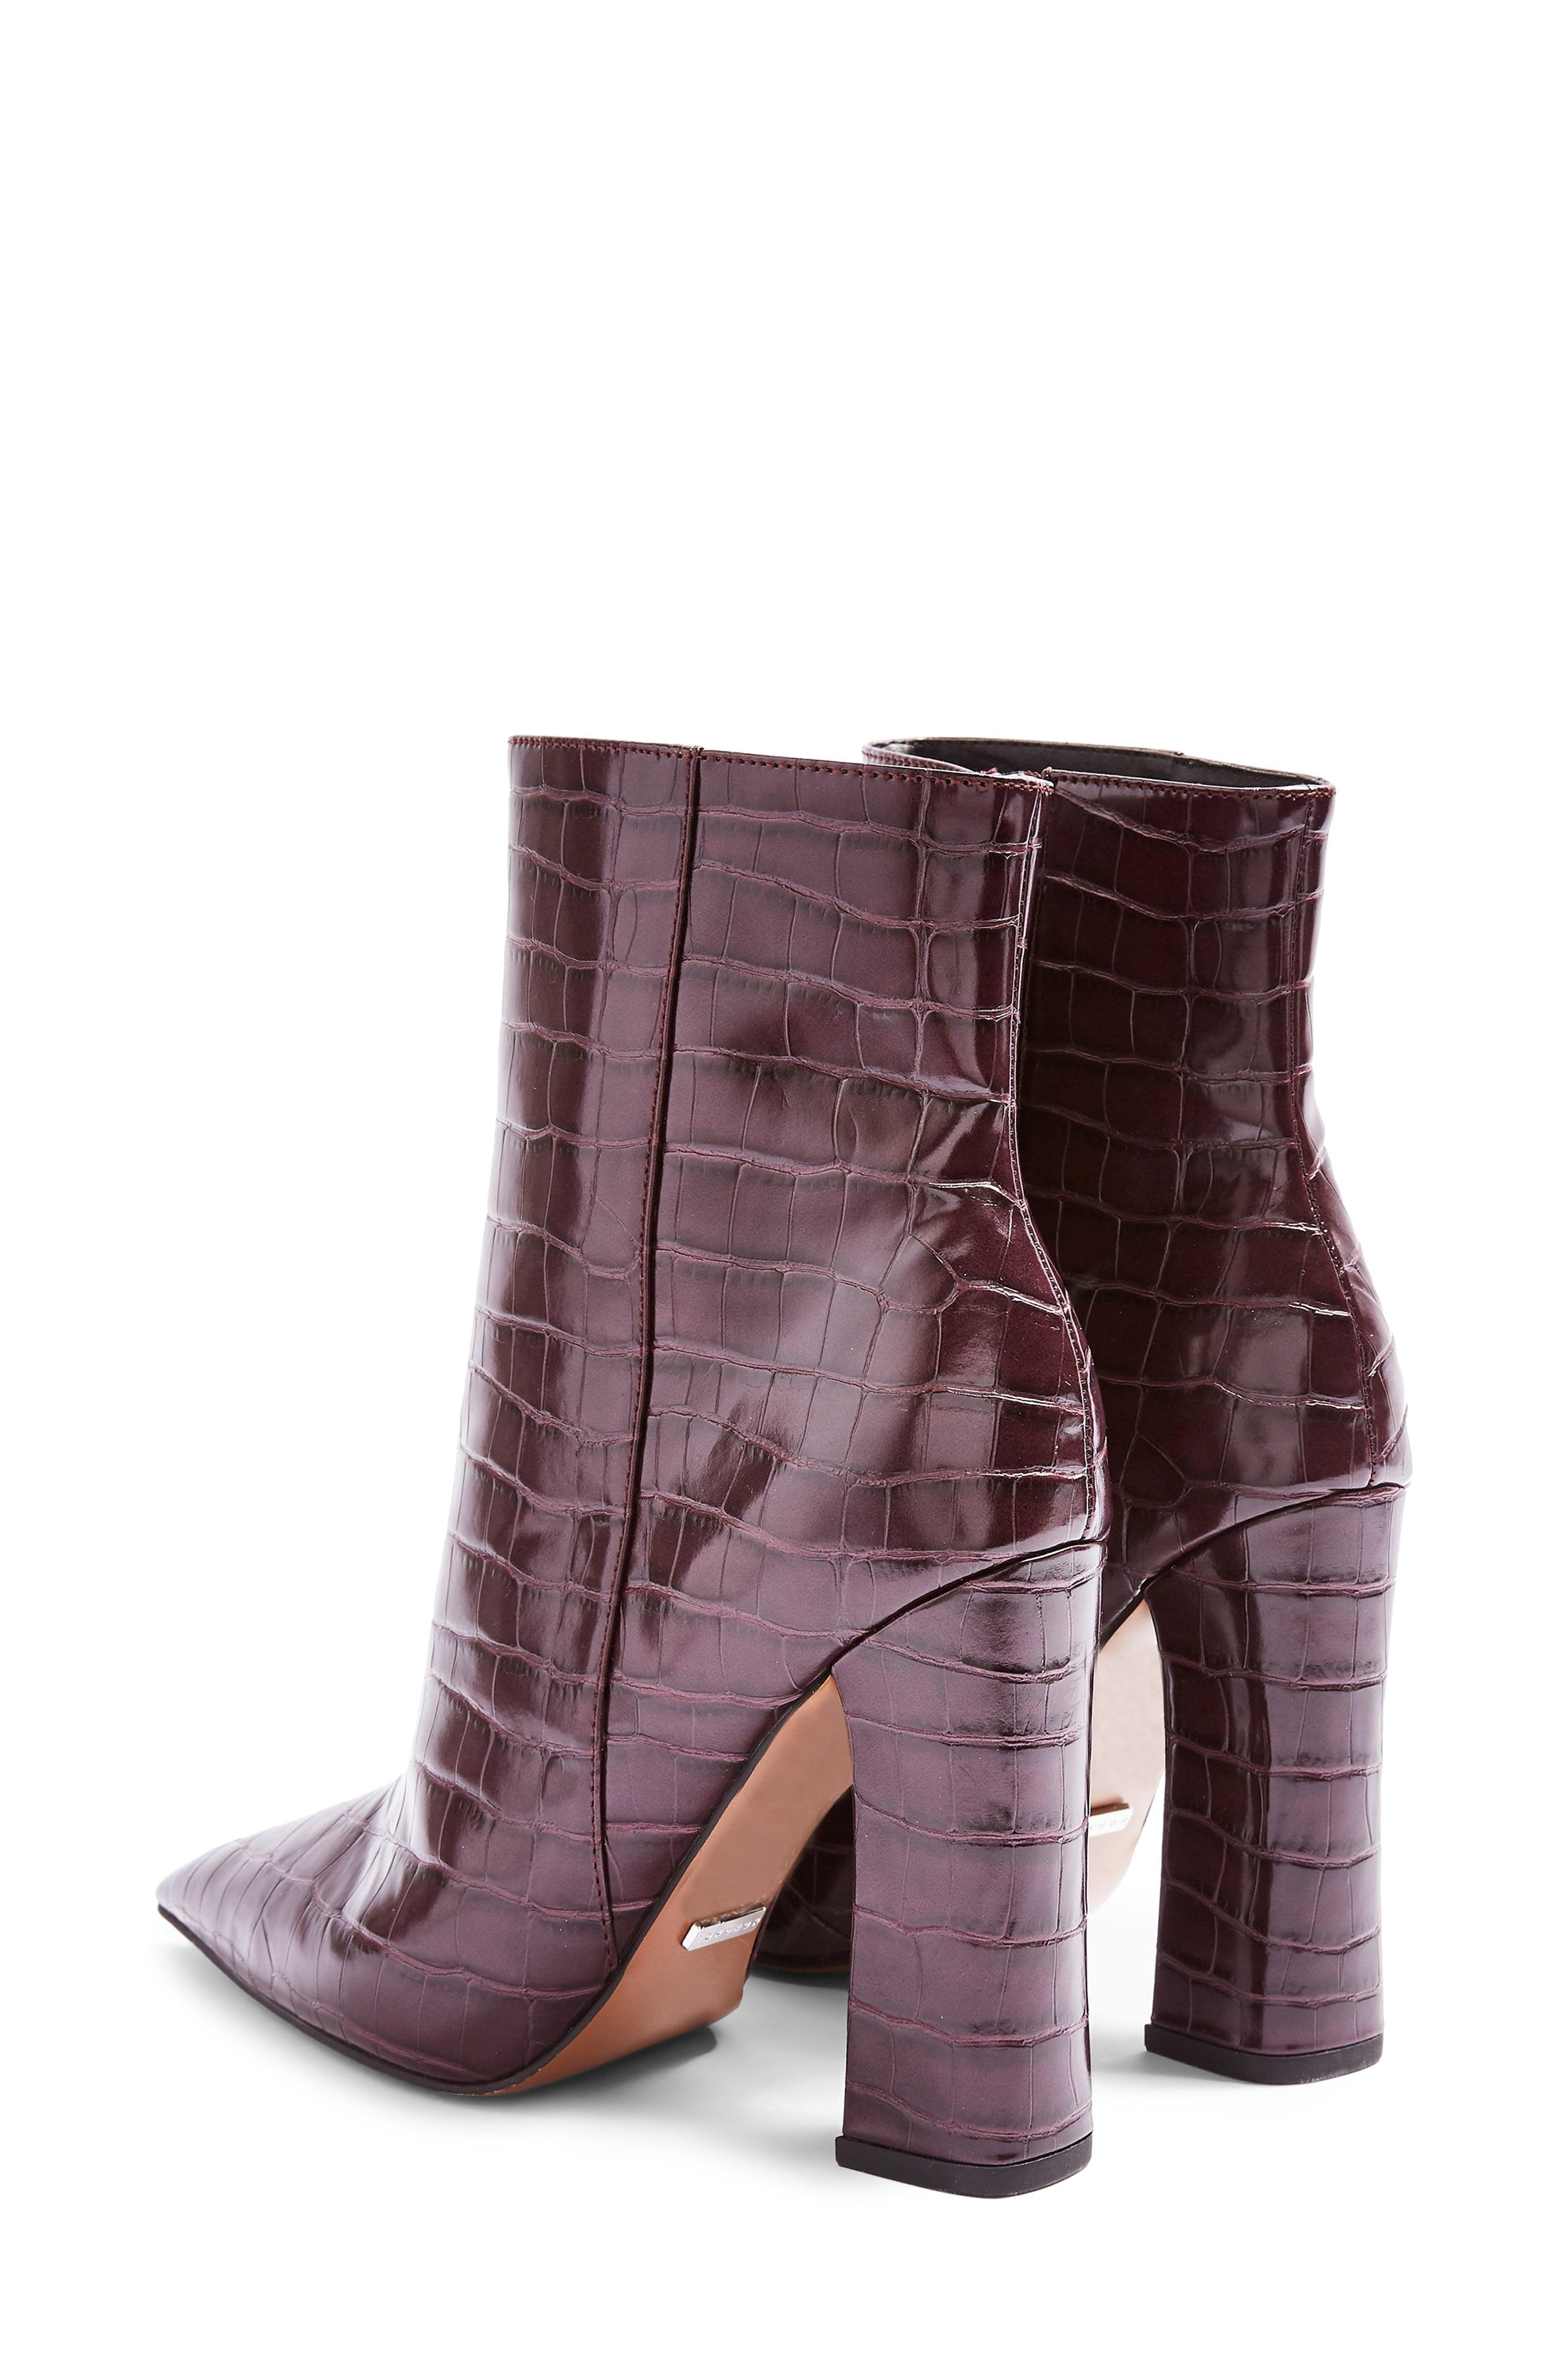 TOPSHOP Harri Point Toe High Heel Boots Burgundy size Uk 8